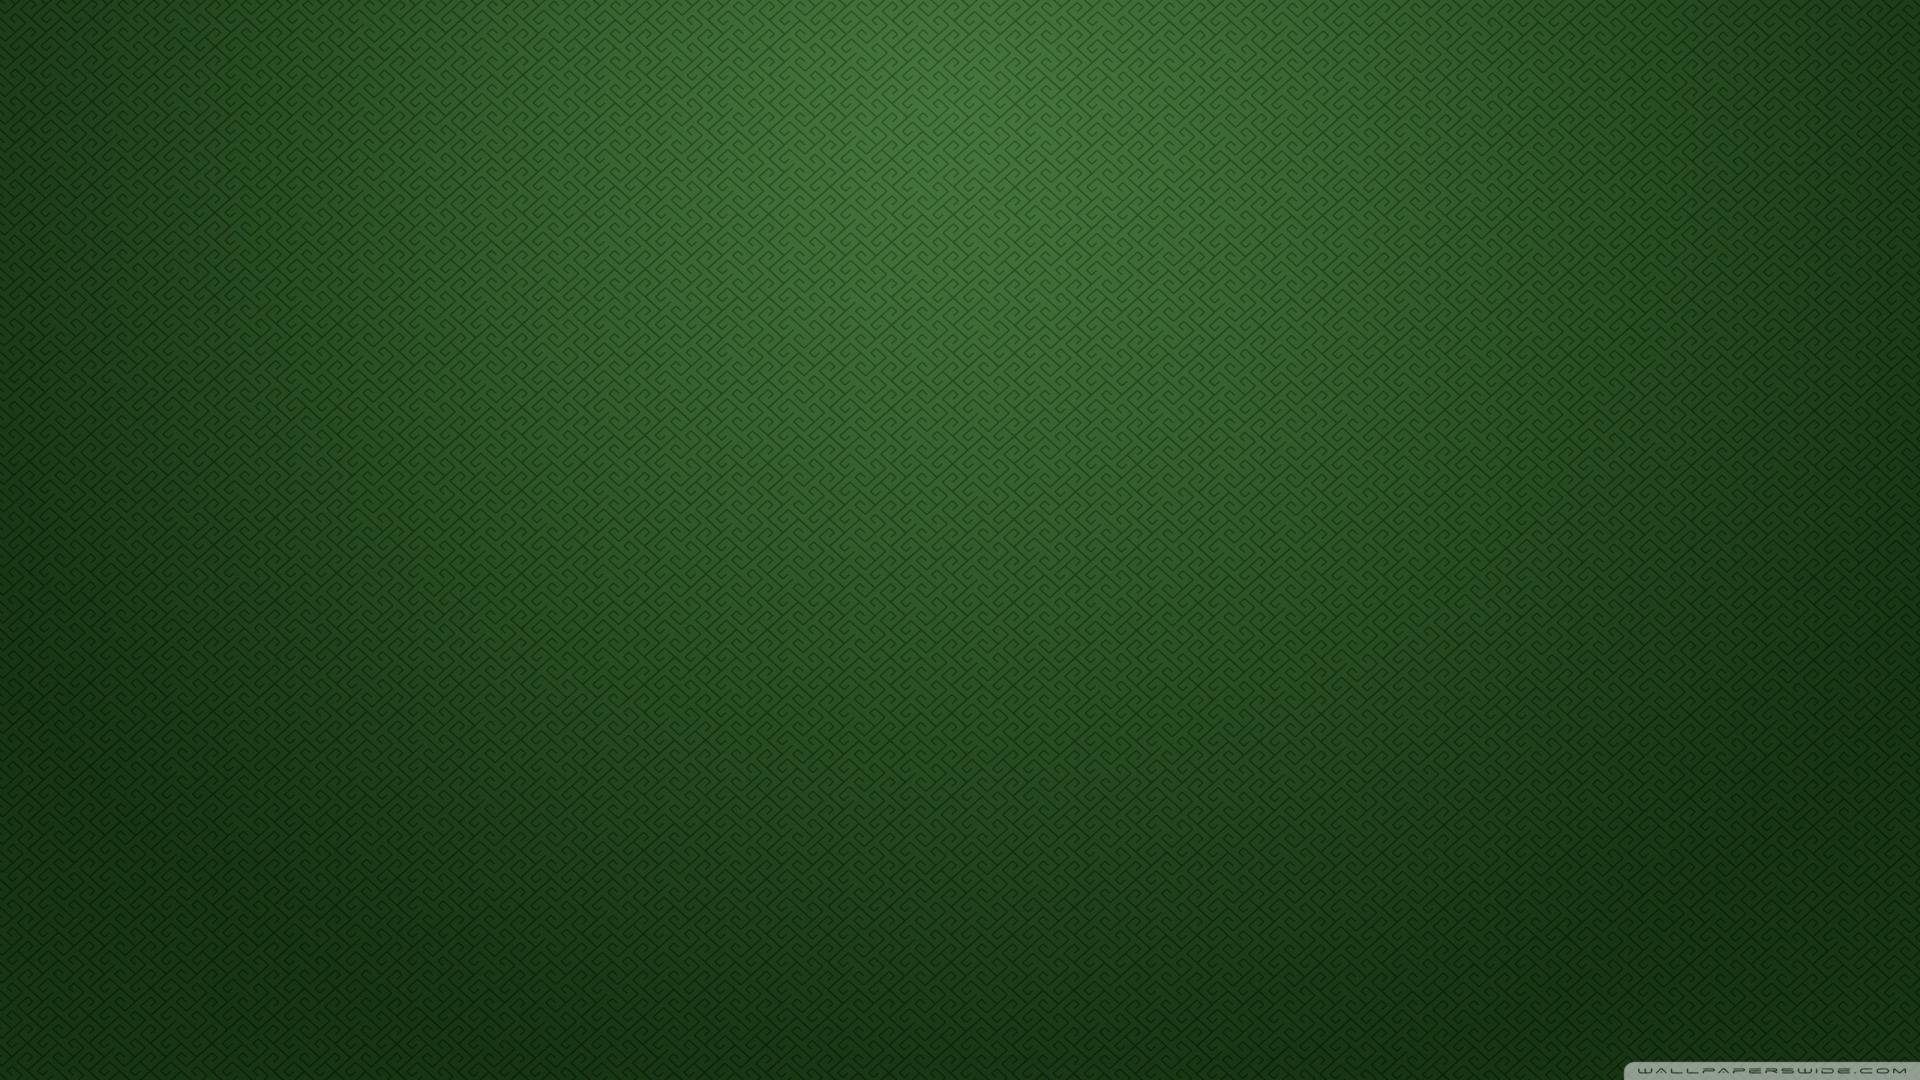 Dark Green Wallpapers Wallpaper Cave